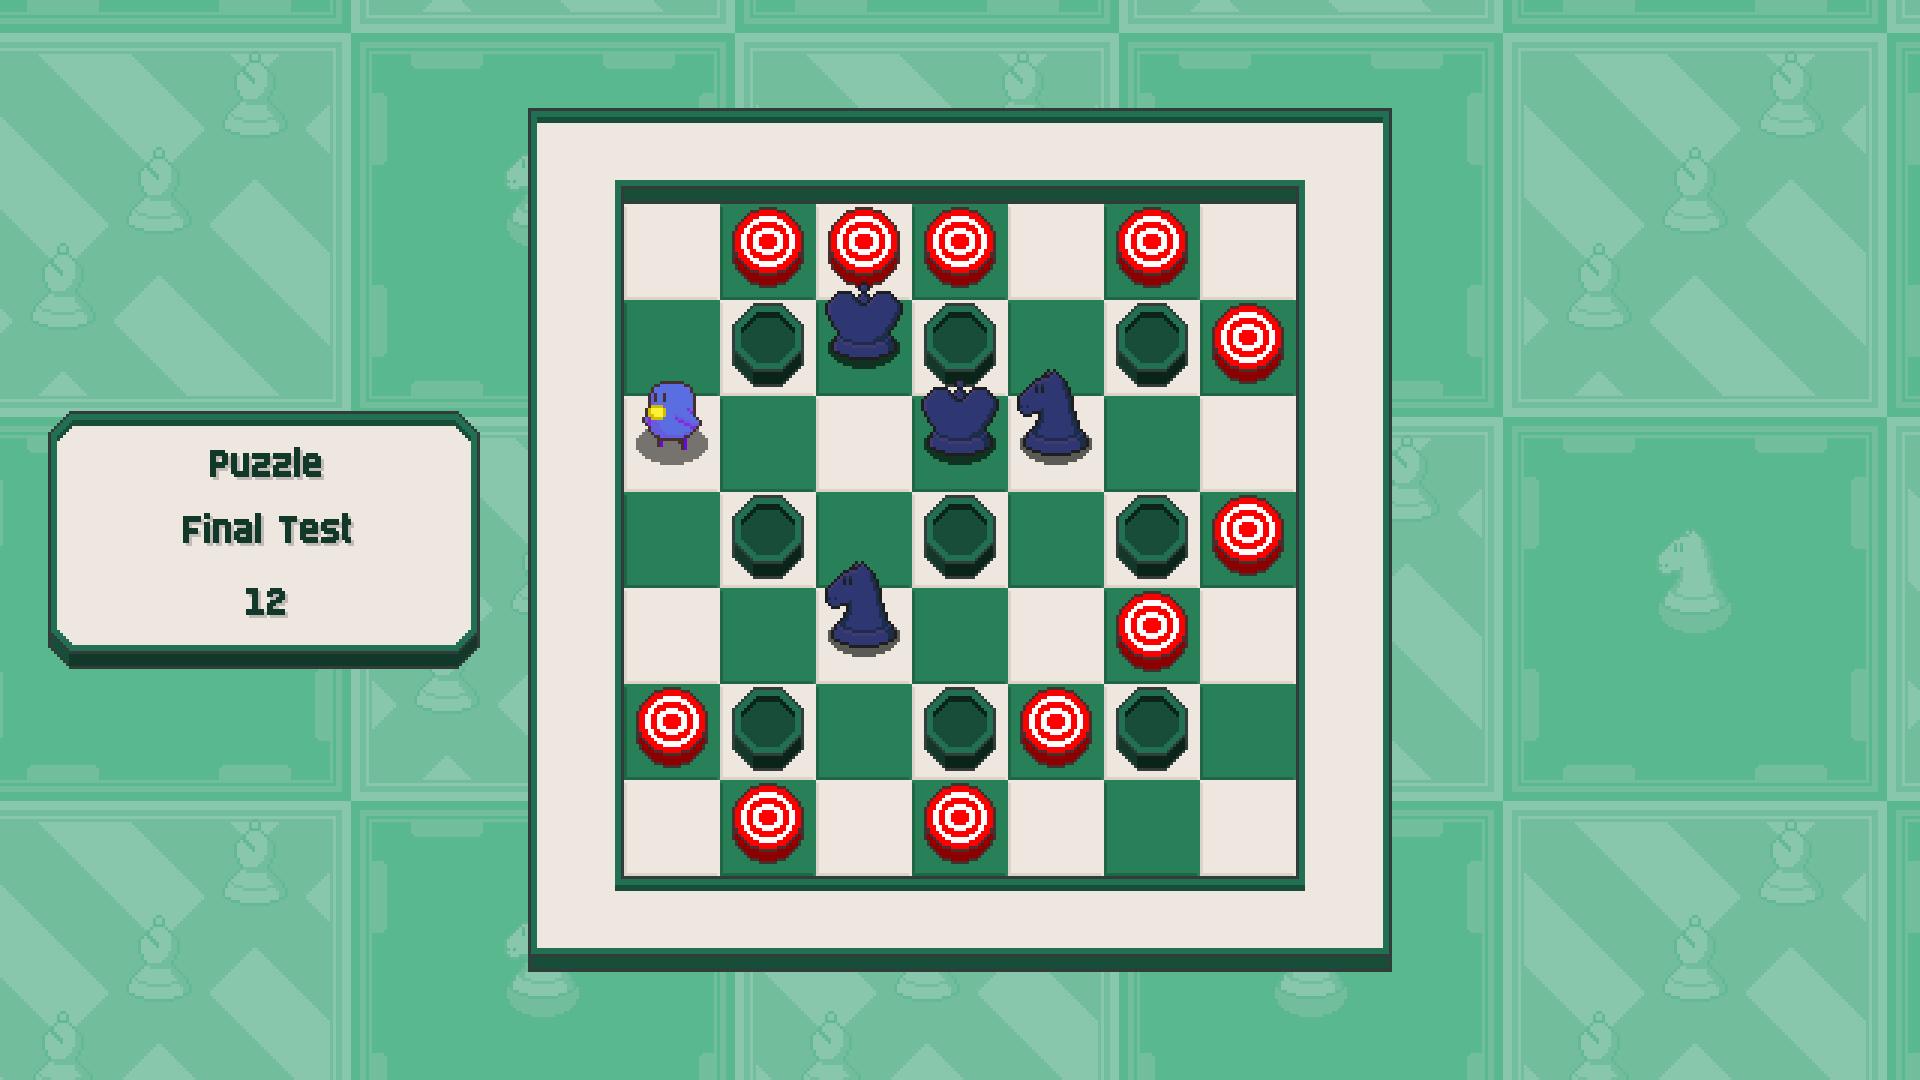 Chessplosion - Puzzle Solution Guide + Achievements Walkthrough - Grandblaster: Final Test - 785262D